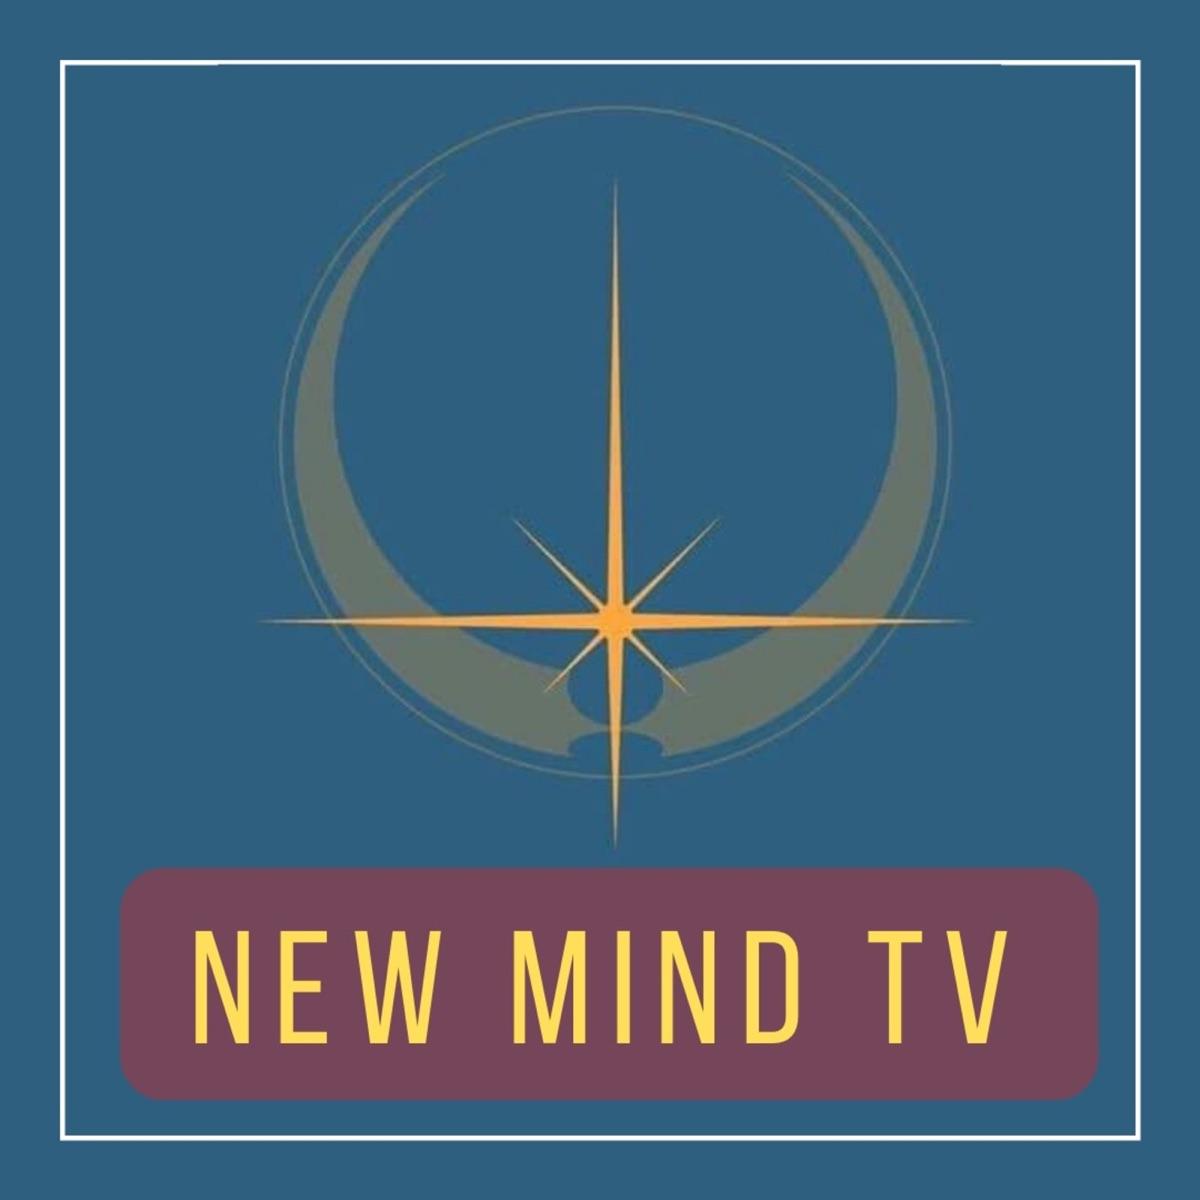 New Mind TV